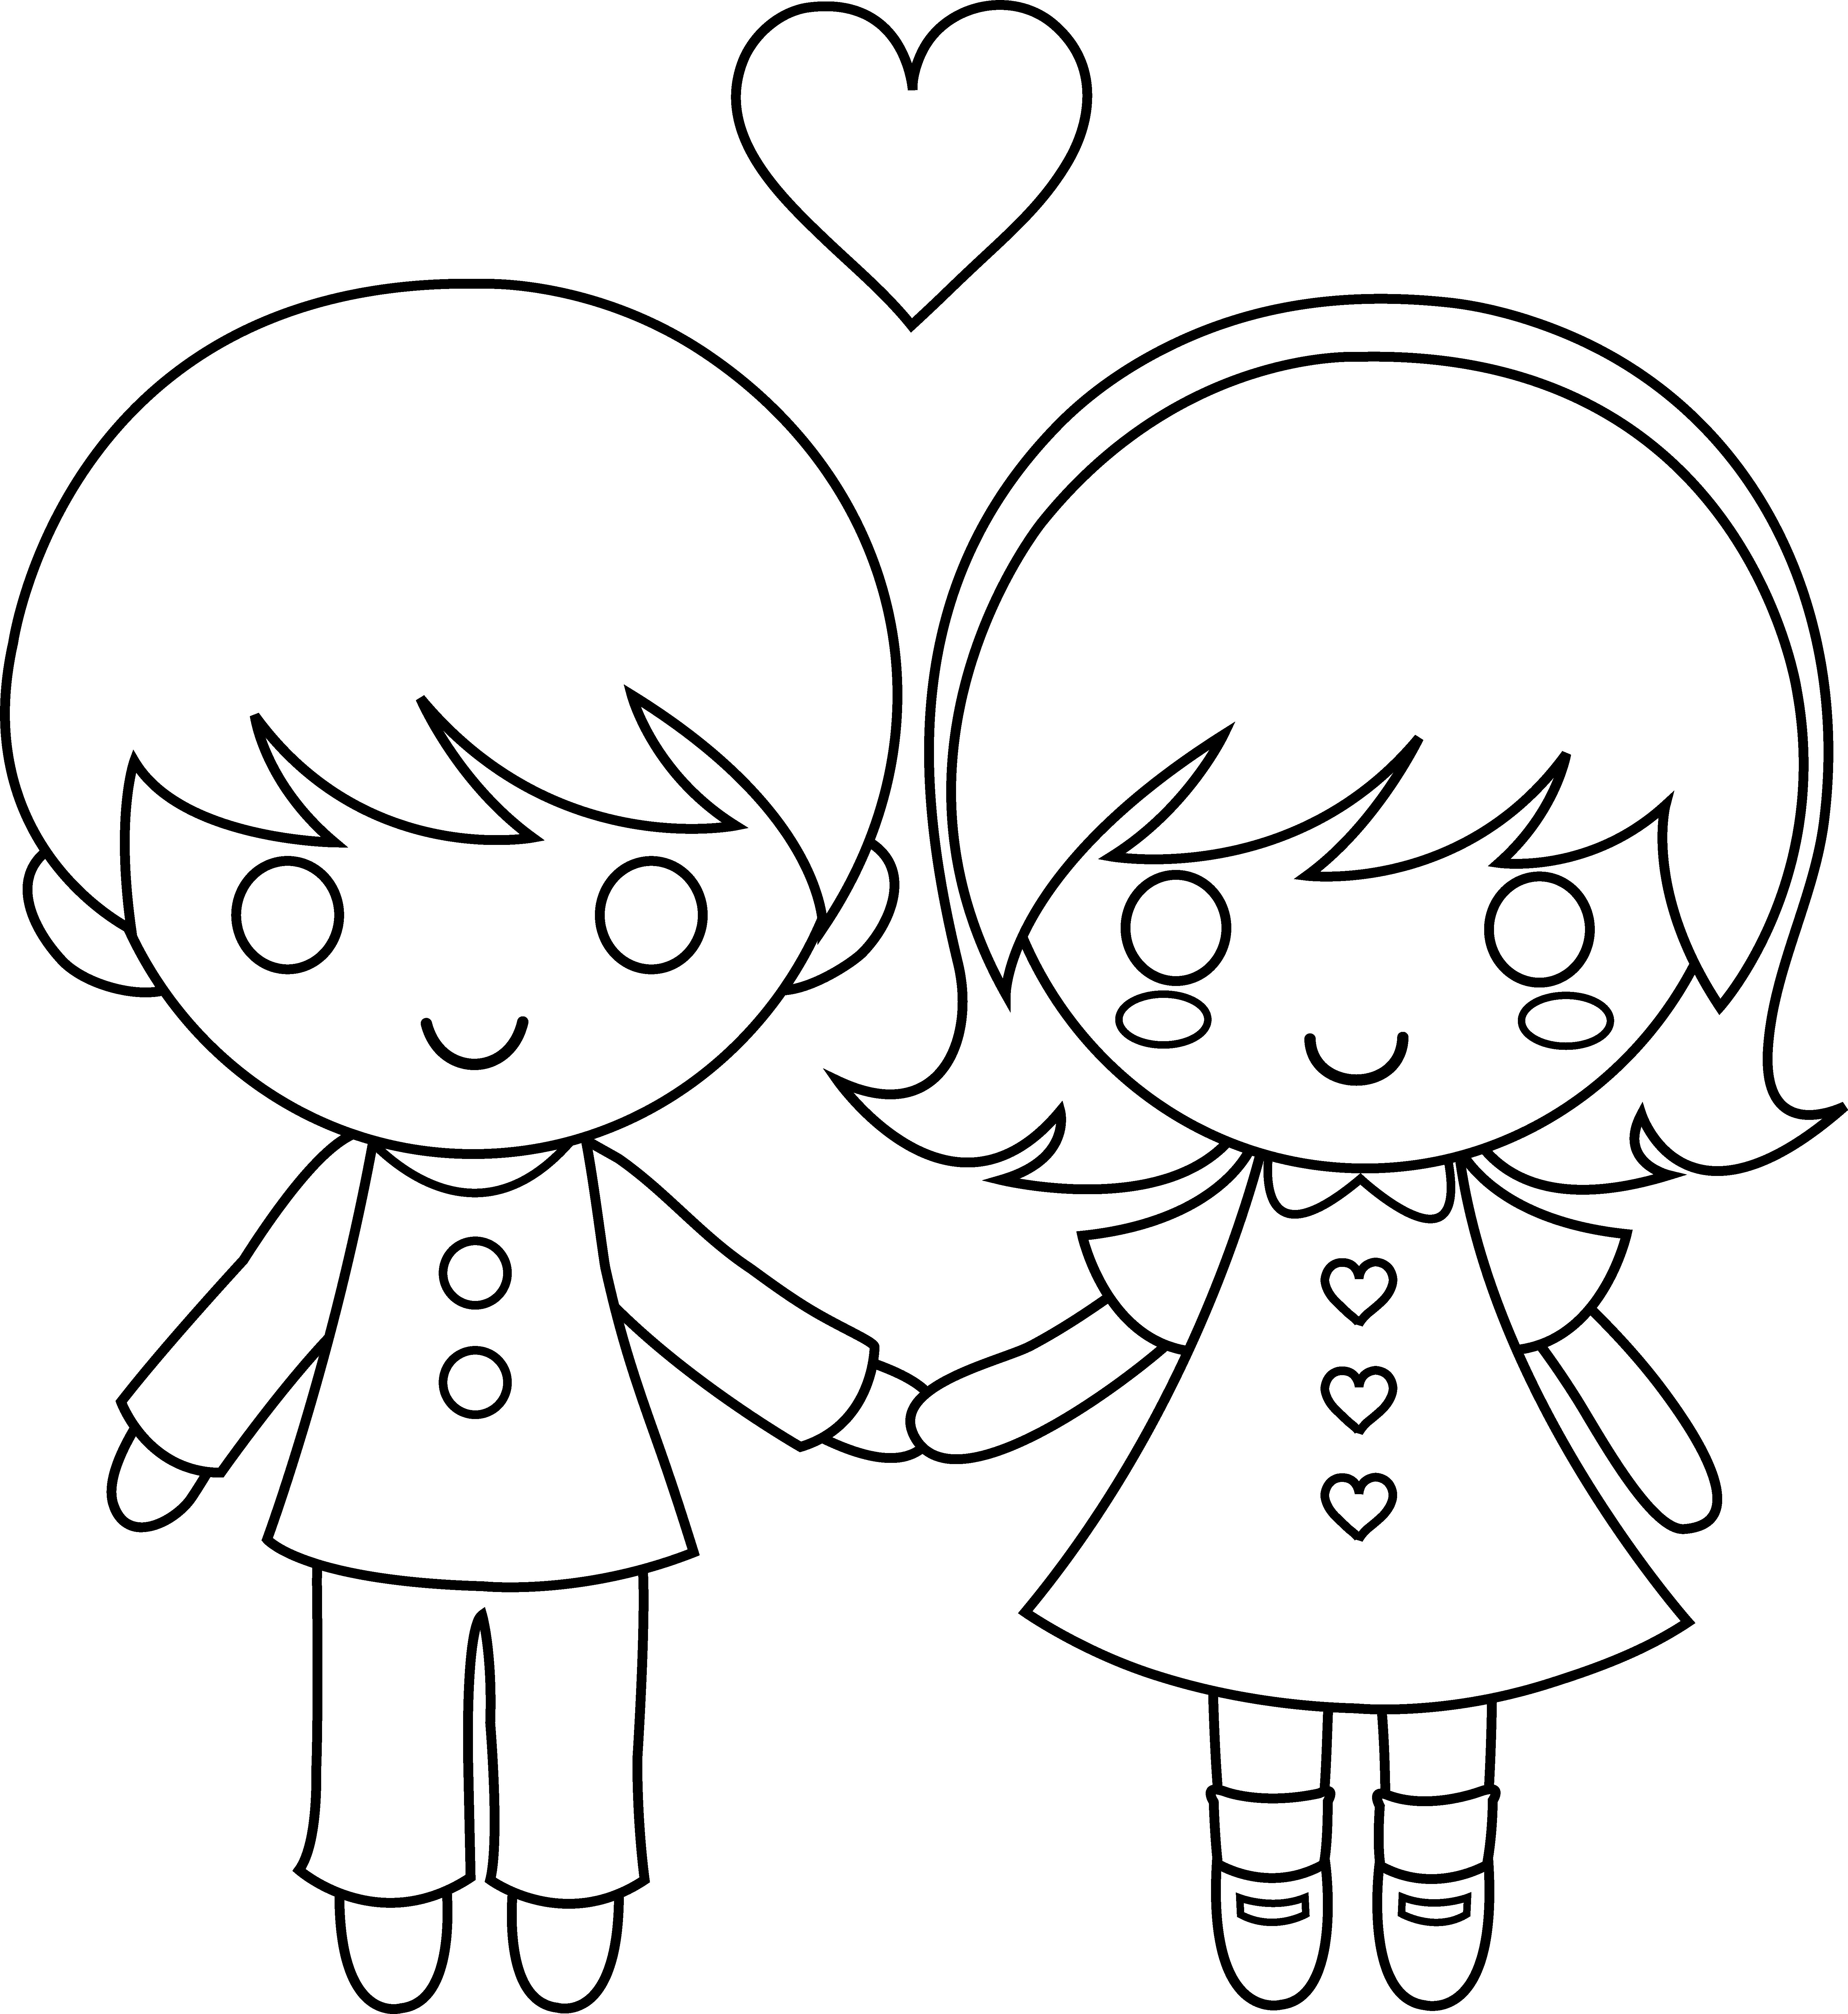 happy valentine's day clip art black and white Valentine